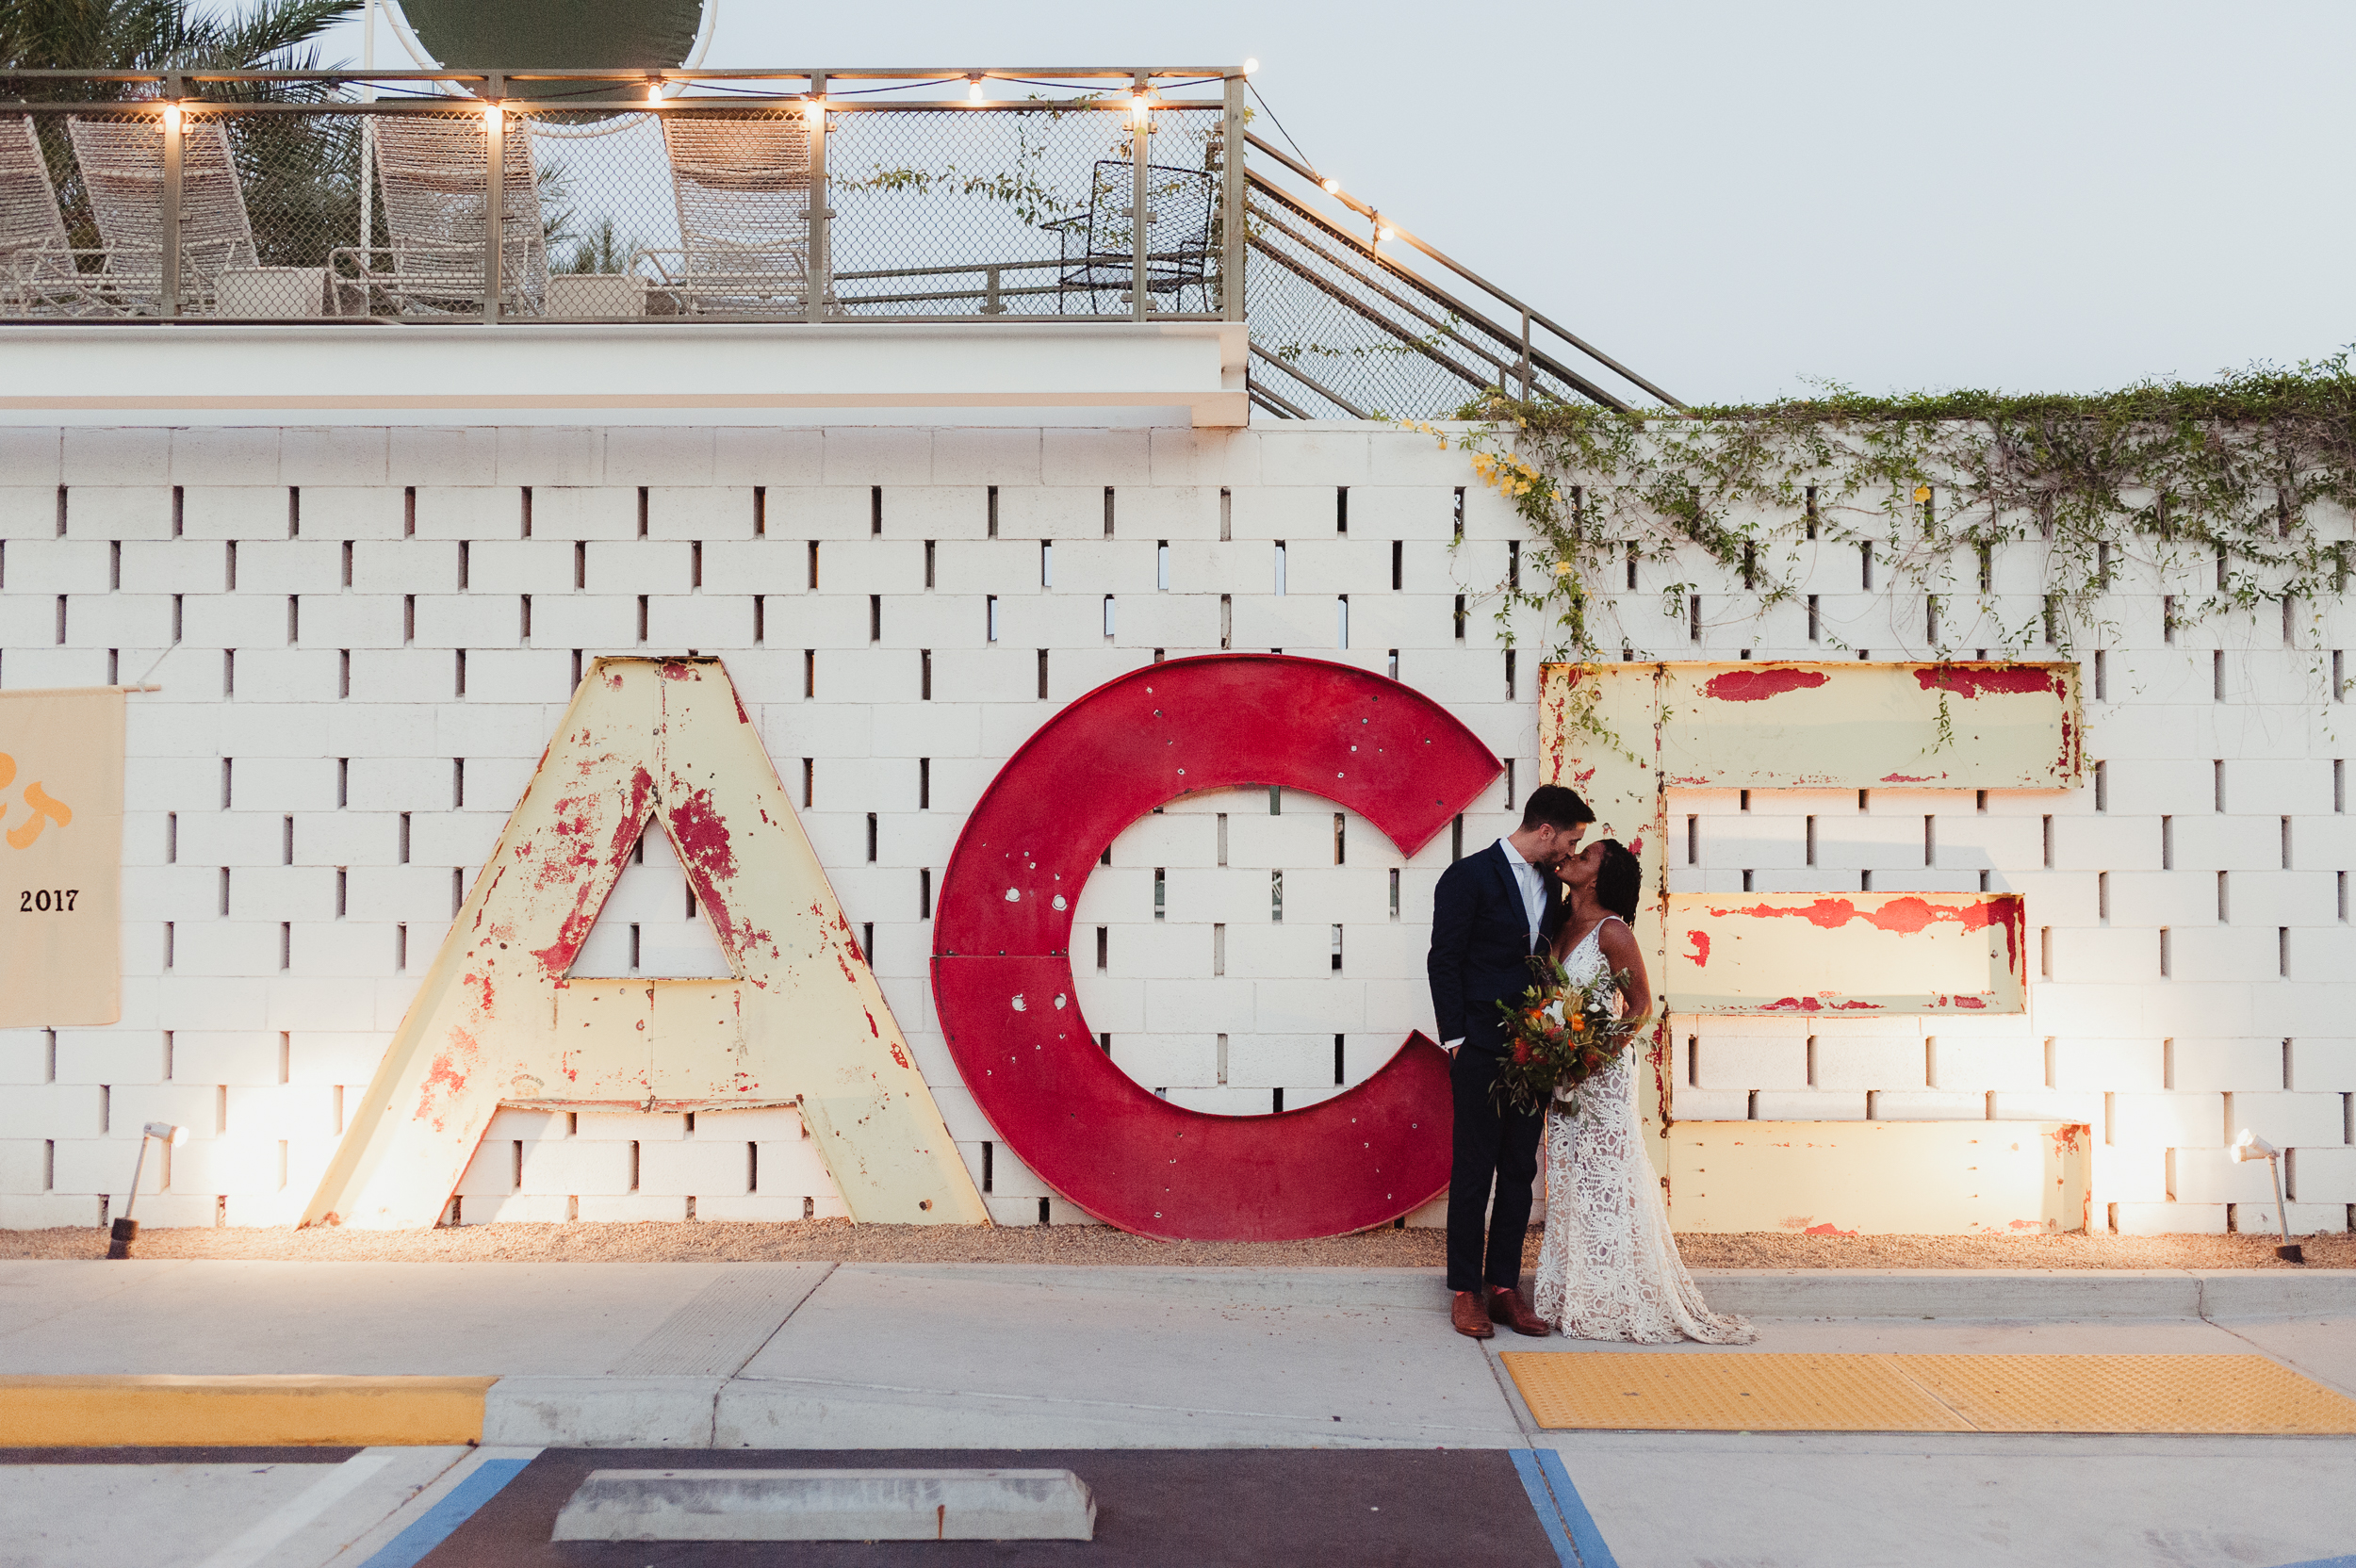 67-93-joshua-tree-ace-hotel-wedding-vivianchen-505.jpg